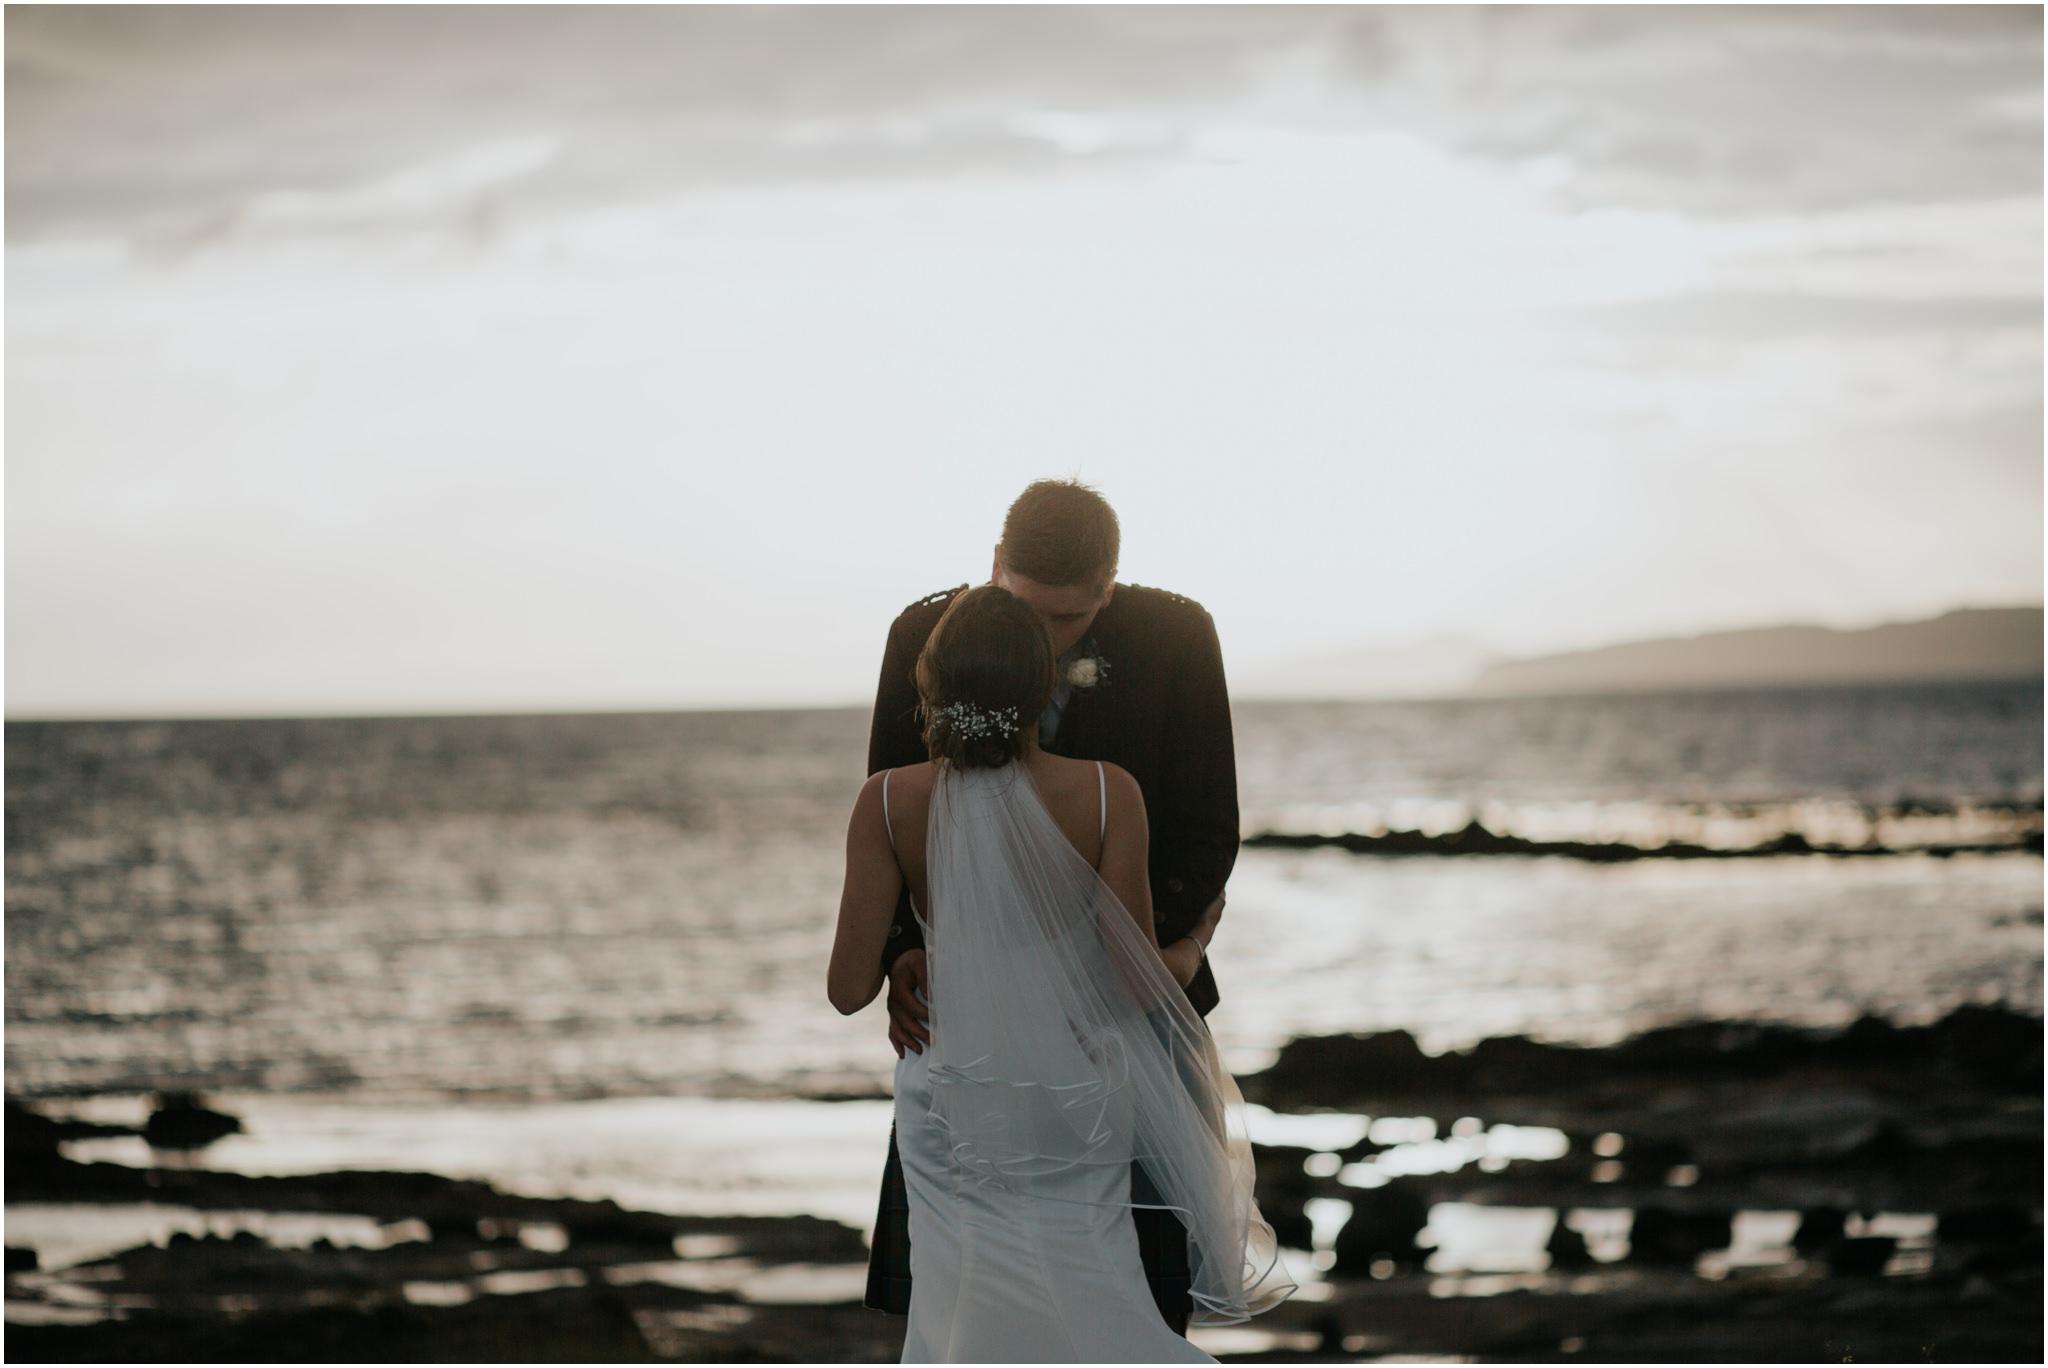 Photography 78 - Glasgow Wedding Photographer - Jordan & Abi - The Waterside Hotel, West Kilbride_0135a.jpg